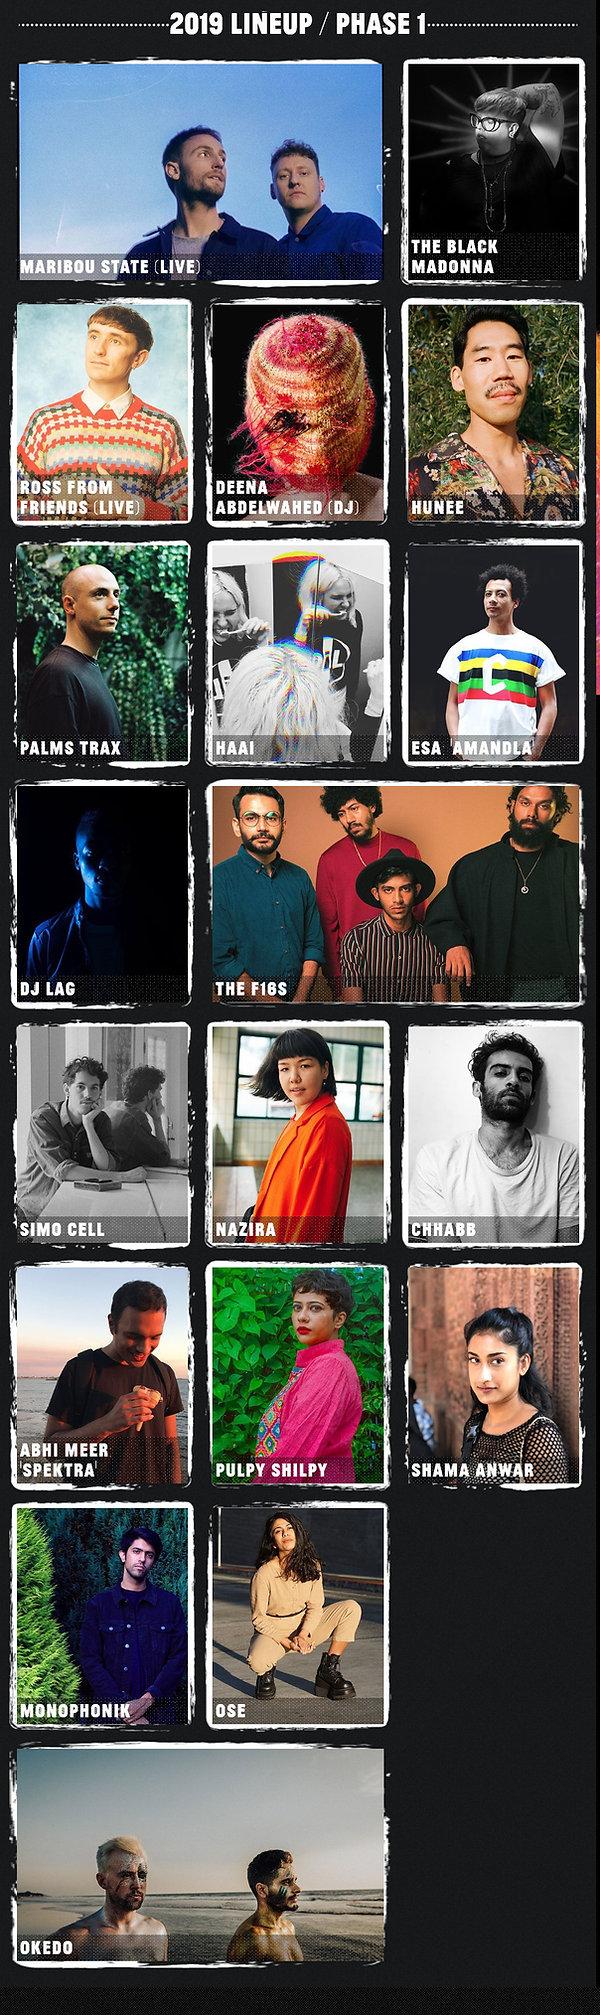 Artists - Magnetic Fields Festival 2019.